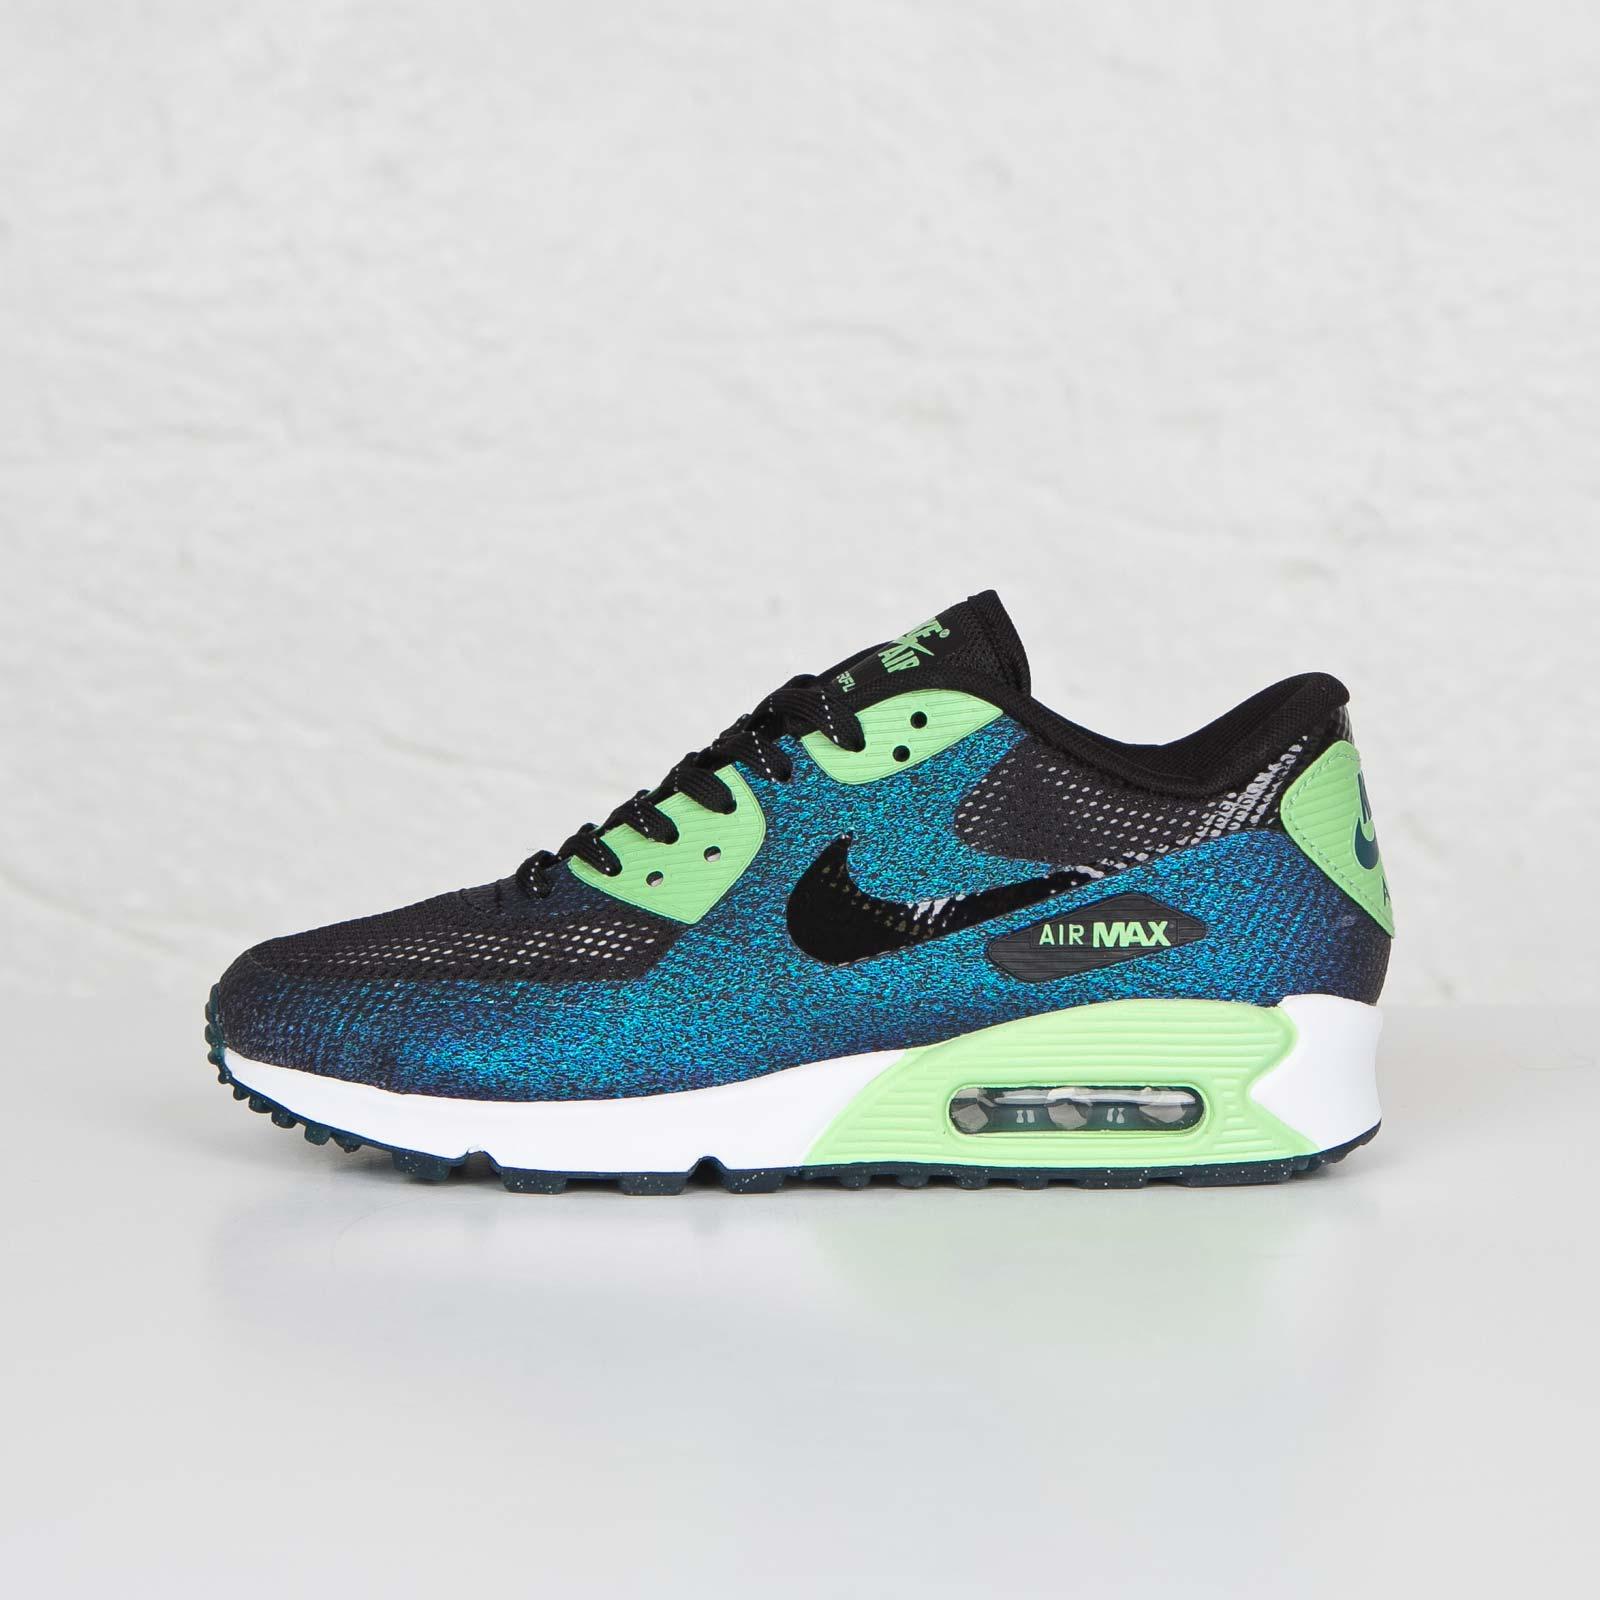 c0fe615e81e Nike Wmns Air Max 90 Hyperfuse WC QS - 811165-001 - Sneakersnstuff ...